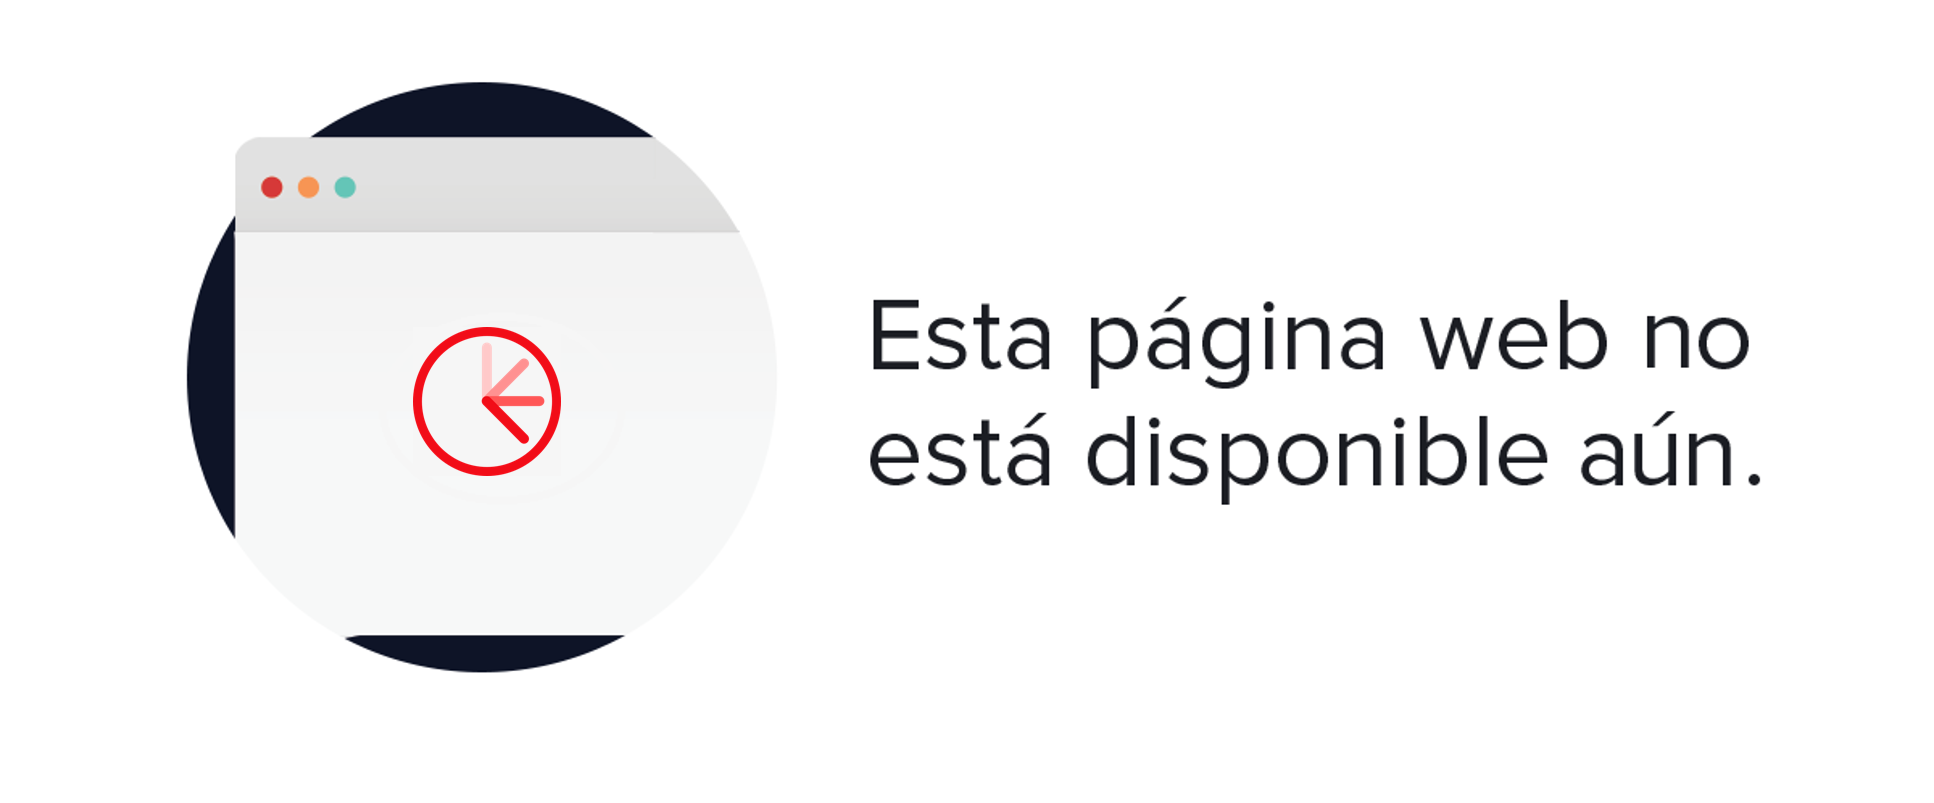 OXXO - Chaqueta de mujer OXXO de tela scuba con cordón Negro 8681613243828 - OGUCNAM